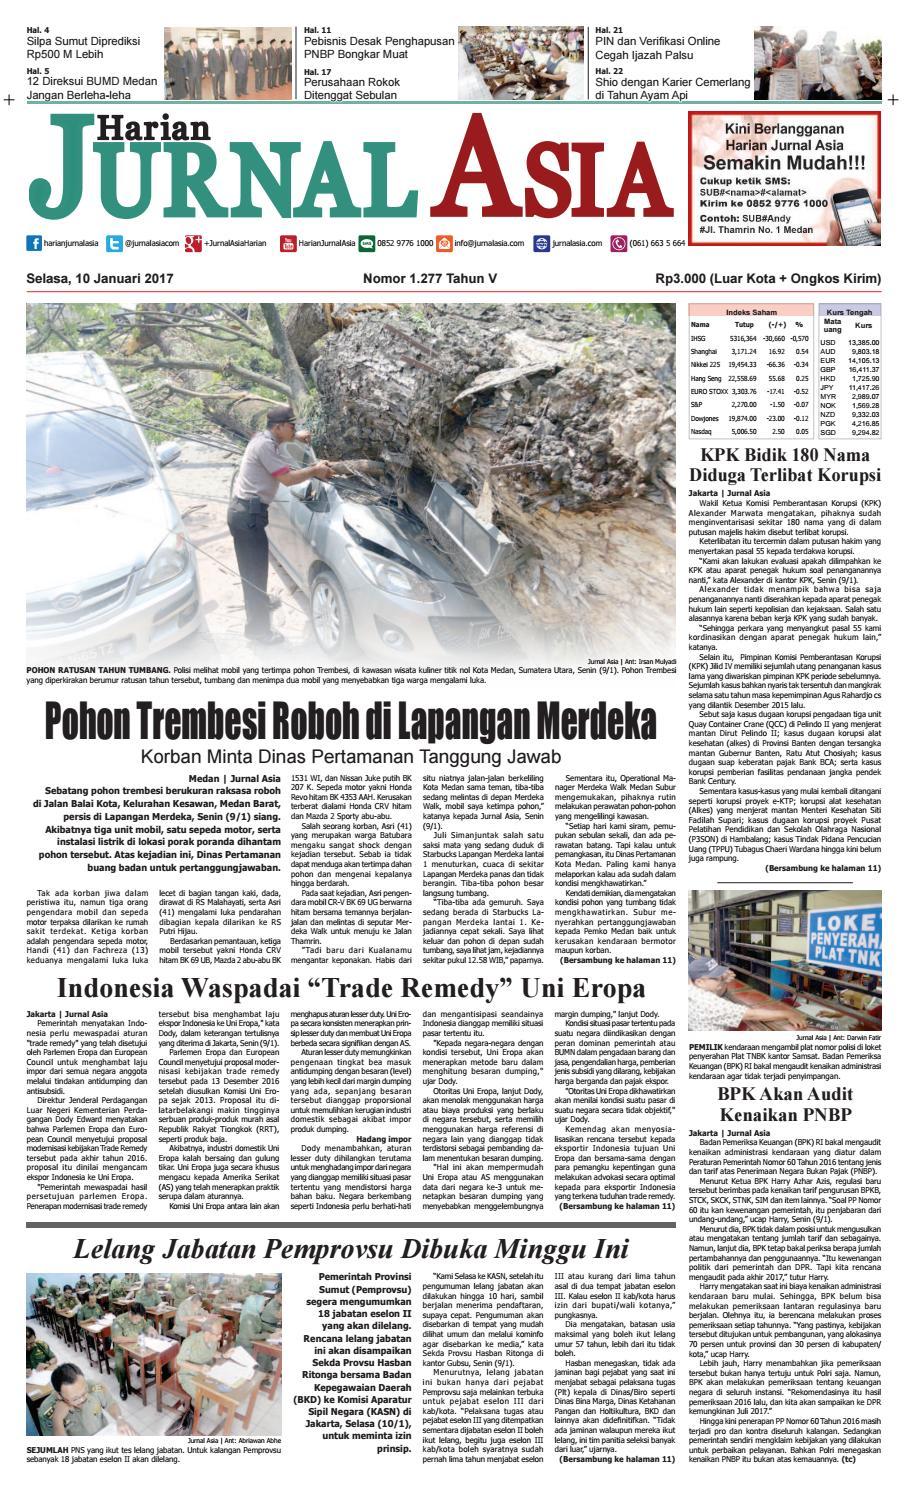 Harian Jurnal Asia Edisi Selasa 10 Januari 2017 By Produk Ukm Bumn Chesse Pie Khas Balikpapan Medan Issuu